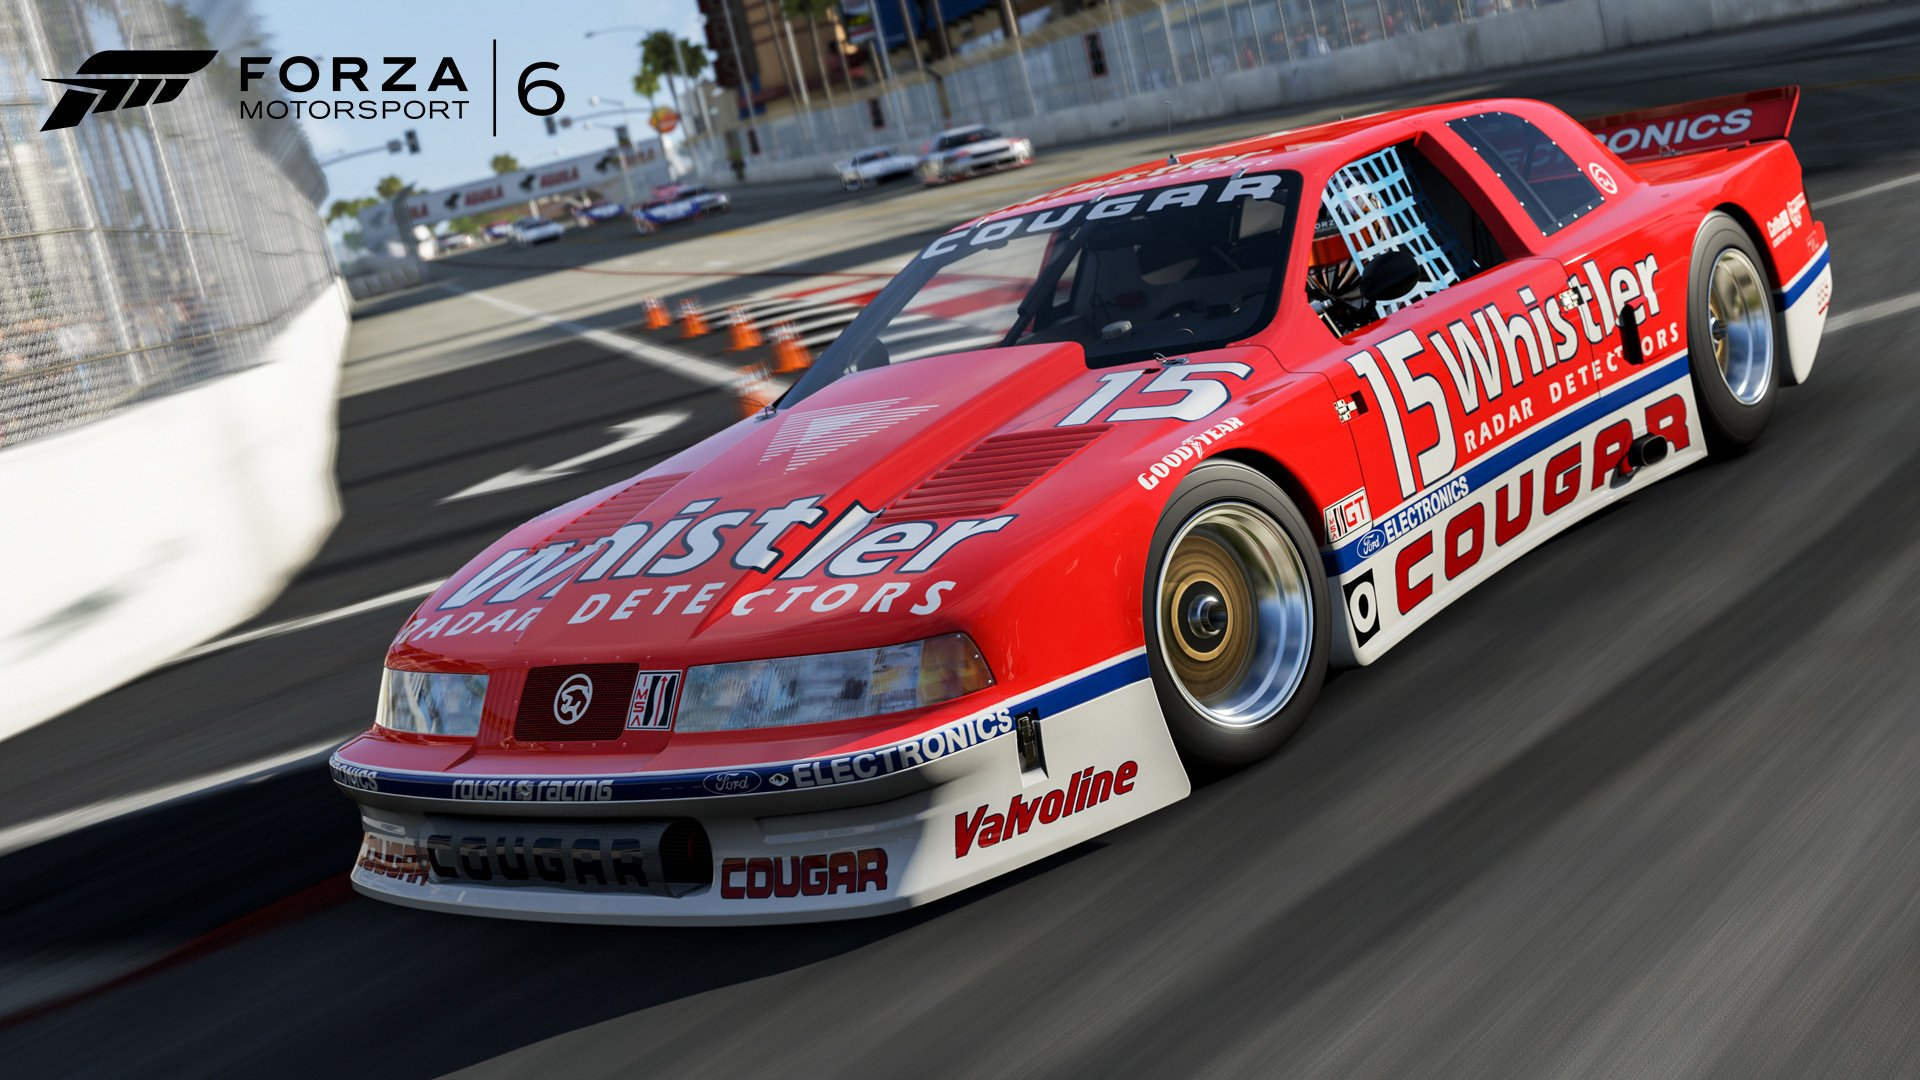 1990 Mercury #15 Whistler Radar Cougar XR-7 Forza Motorsport 6